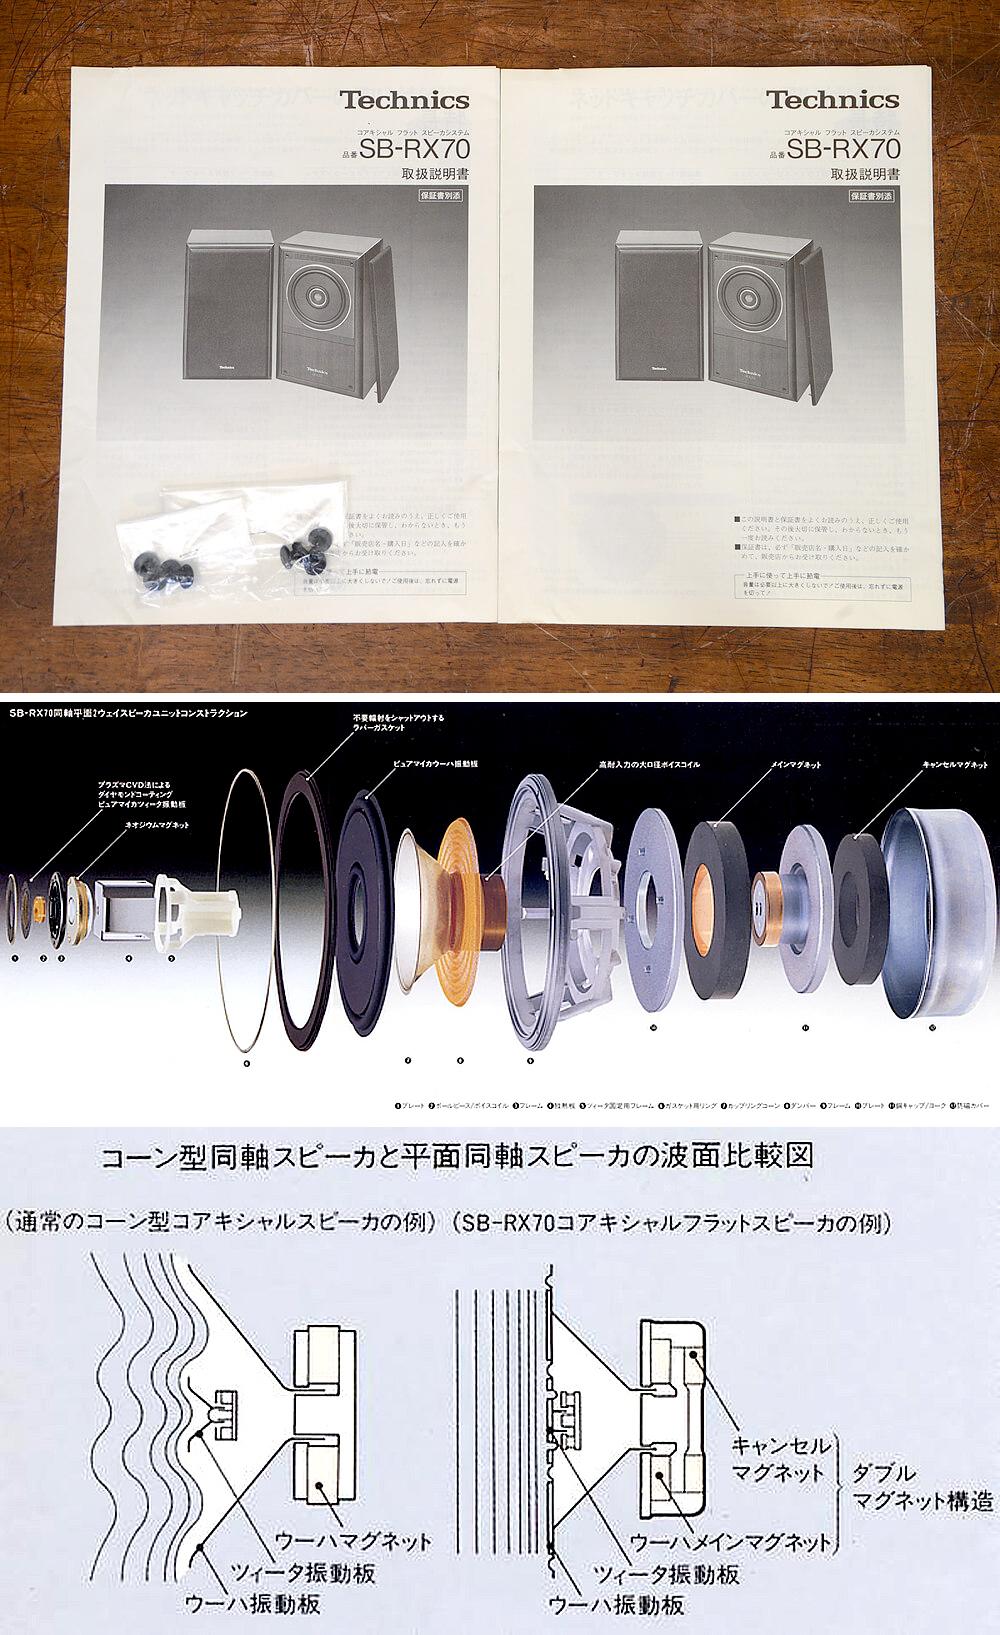 Technics SB-RX70 平面同軸型スピーカー7枚目